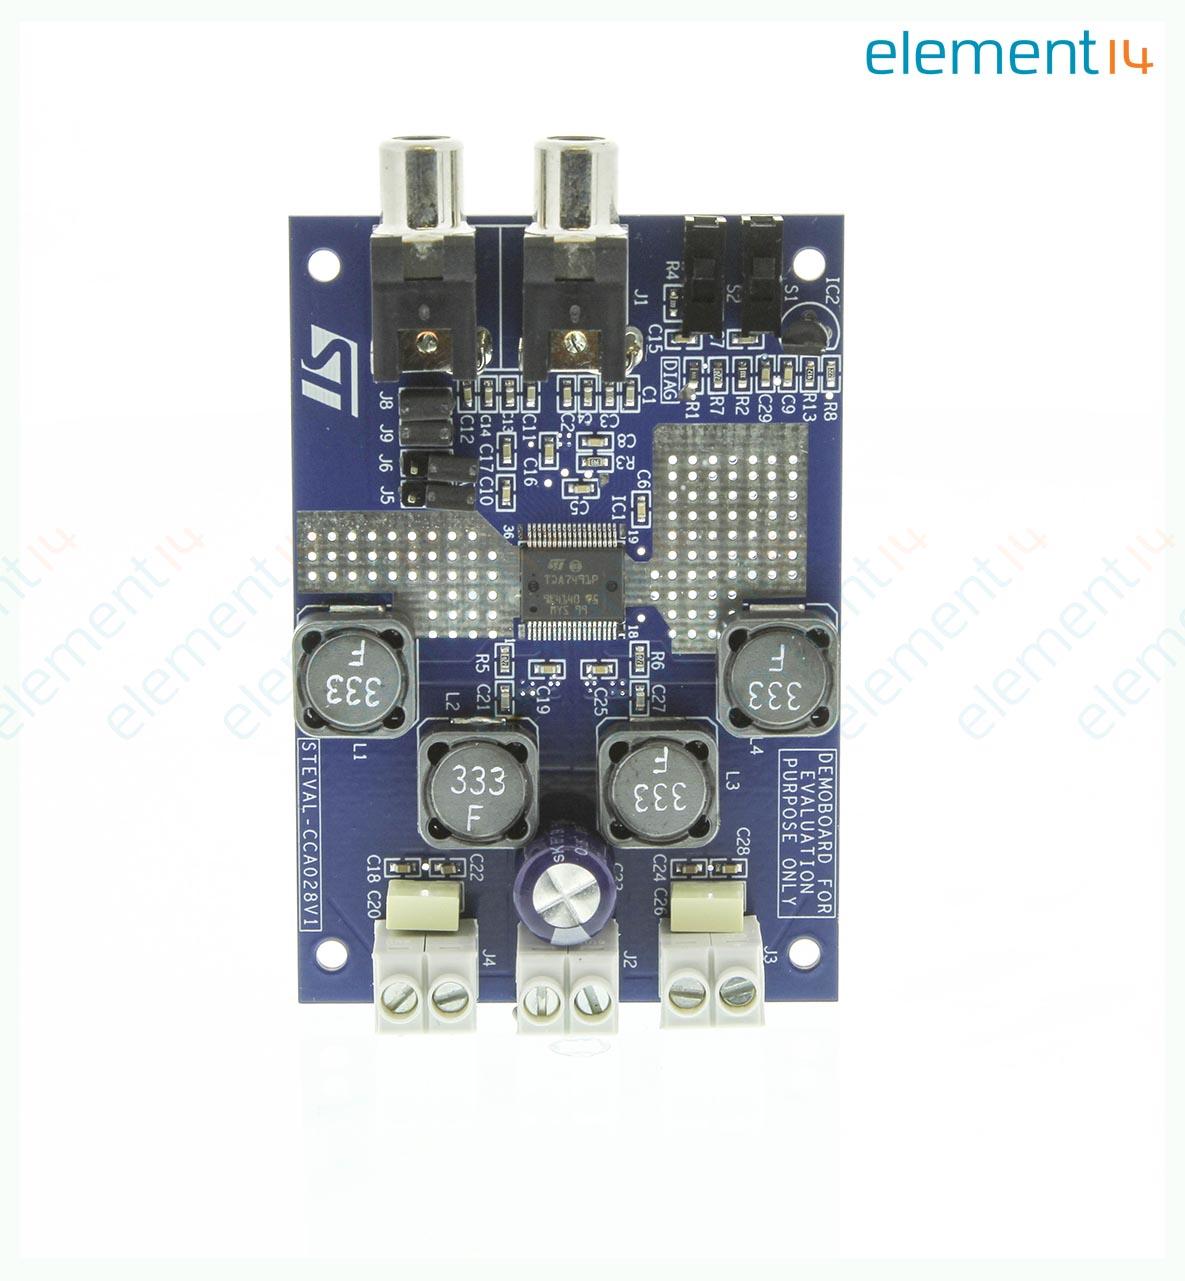 Steval Cca028v1 Stmicroelectronics Evaluation Board Audio Power Buy Amplifier Circuit Boardaudio Class D Tda7491p